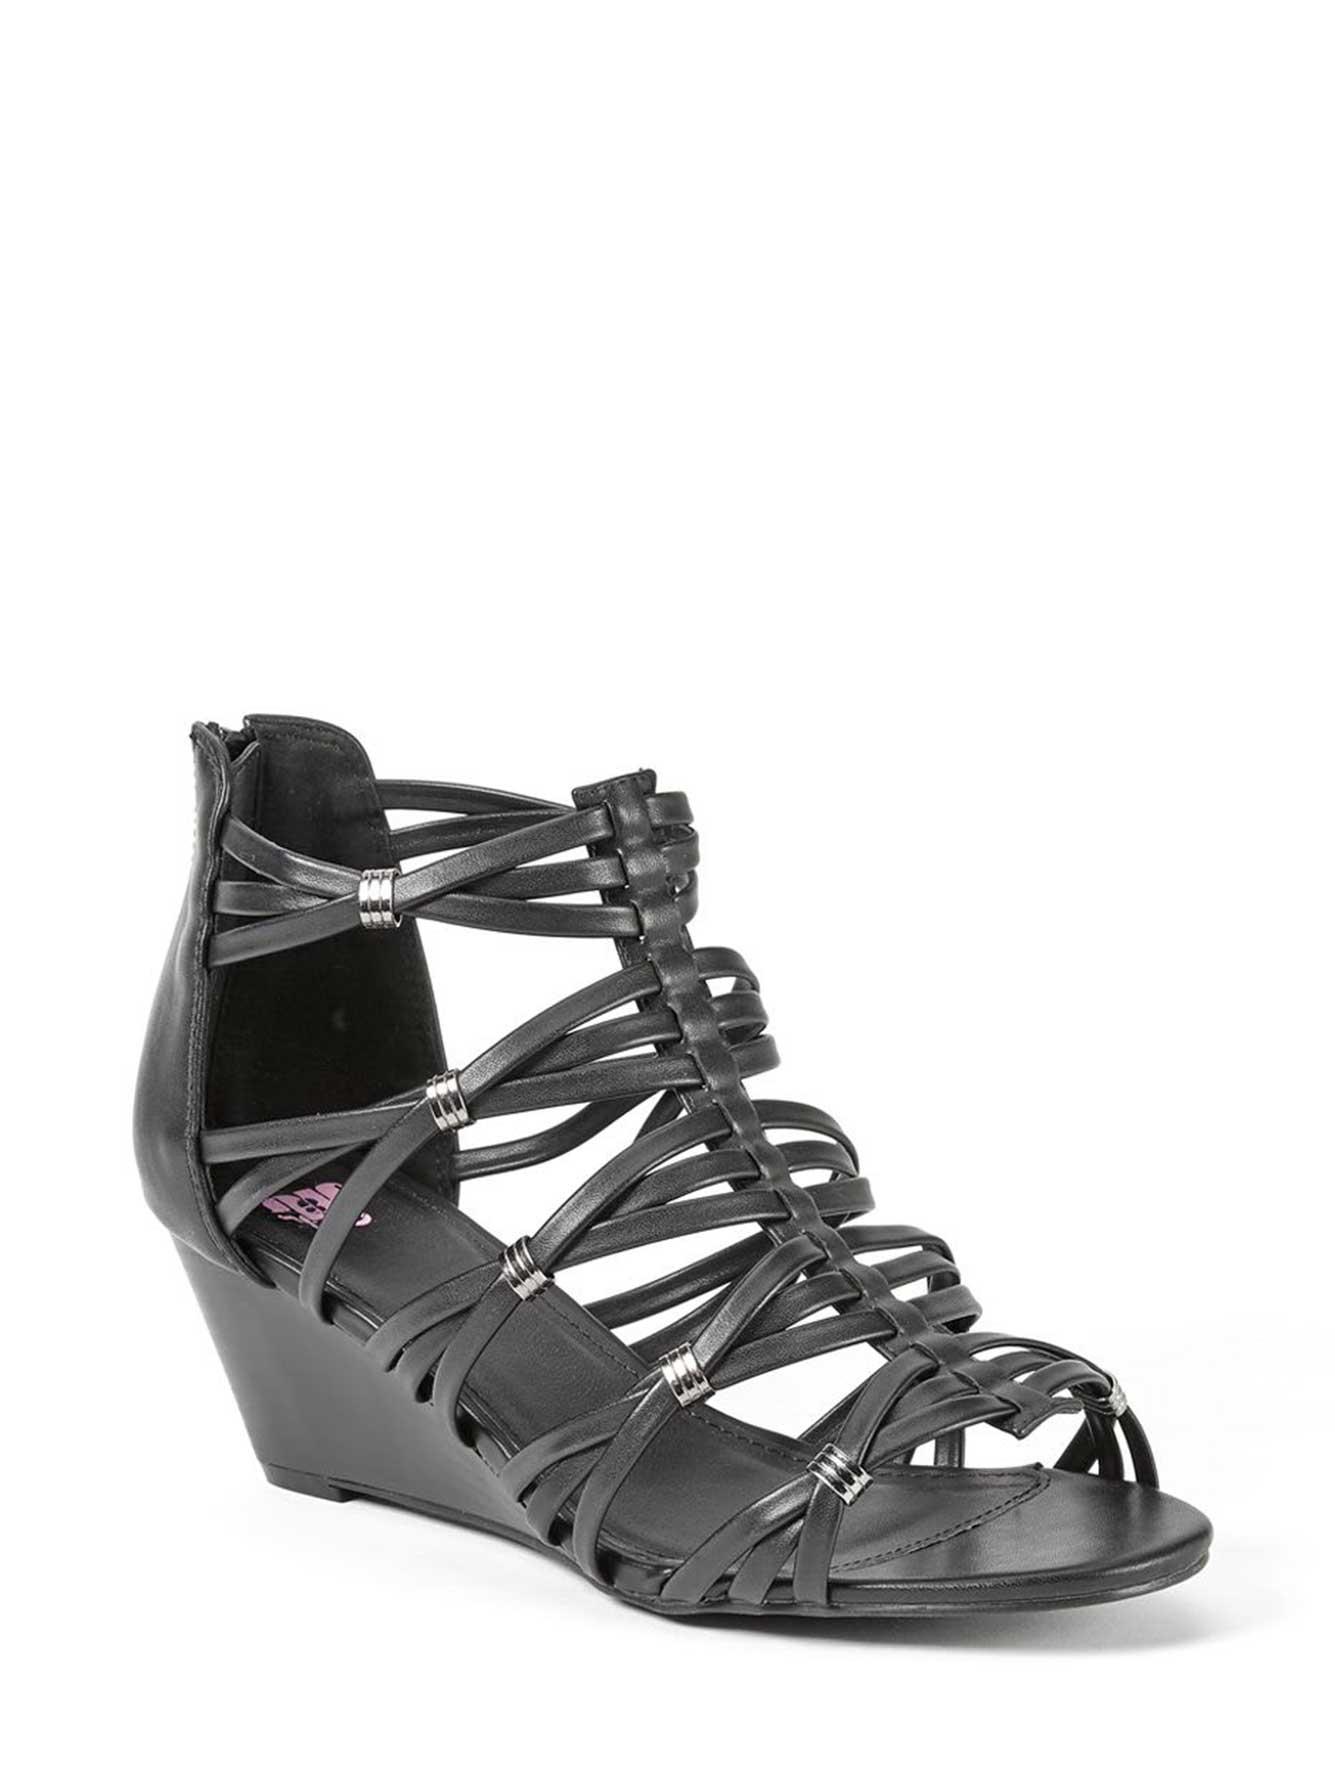 c263a66d271 Wide-Width Multri Strap Wedge Sandals